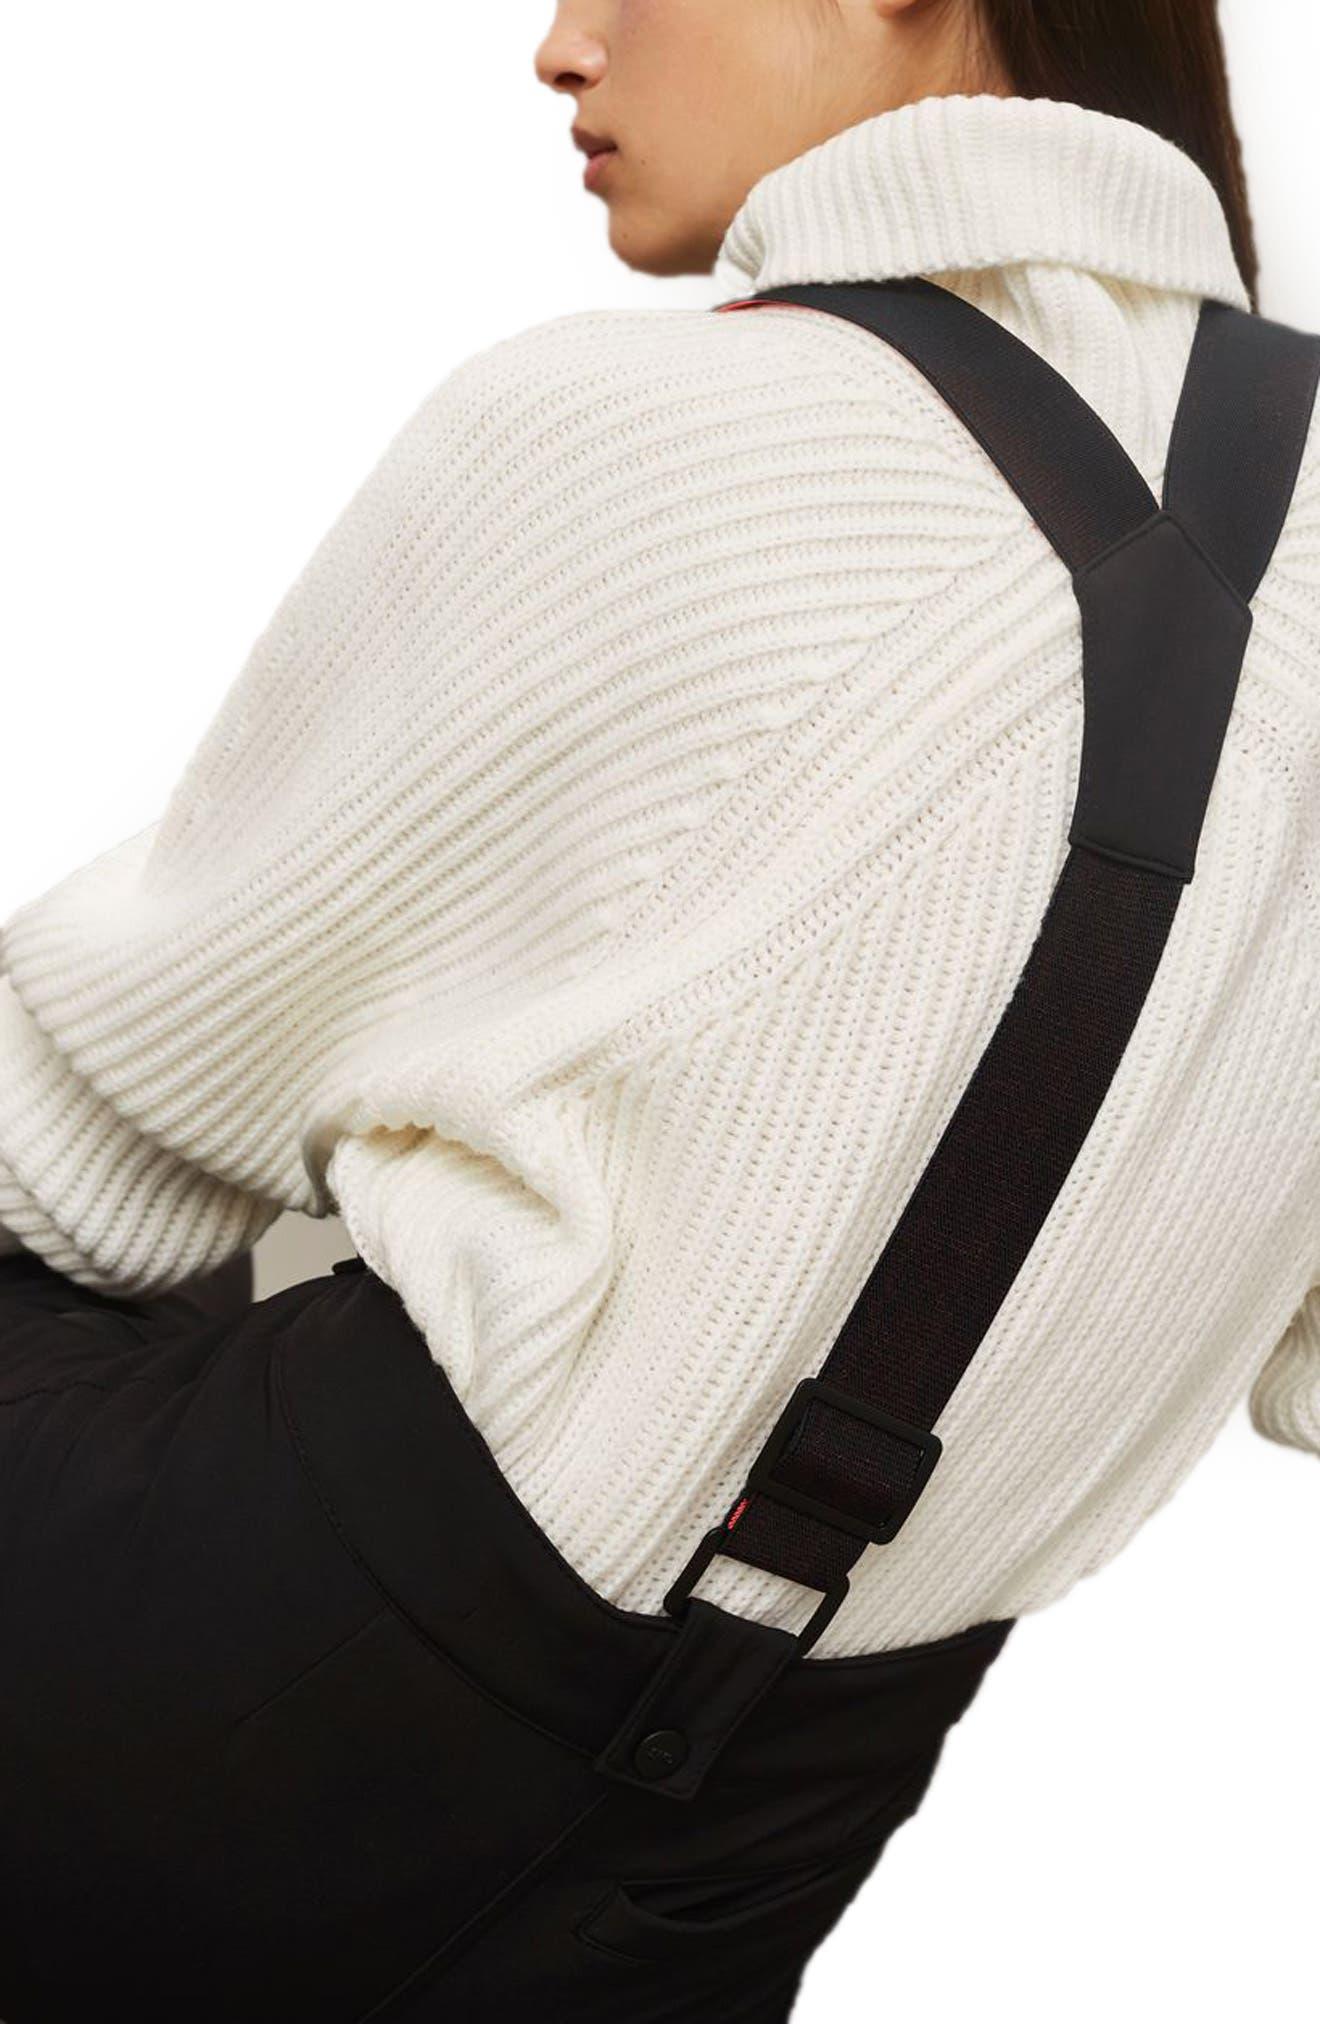 SNO Ace Suspender Ski Pants,                             Alternate thumbnail 4, color,                             001